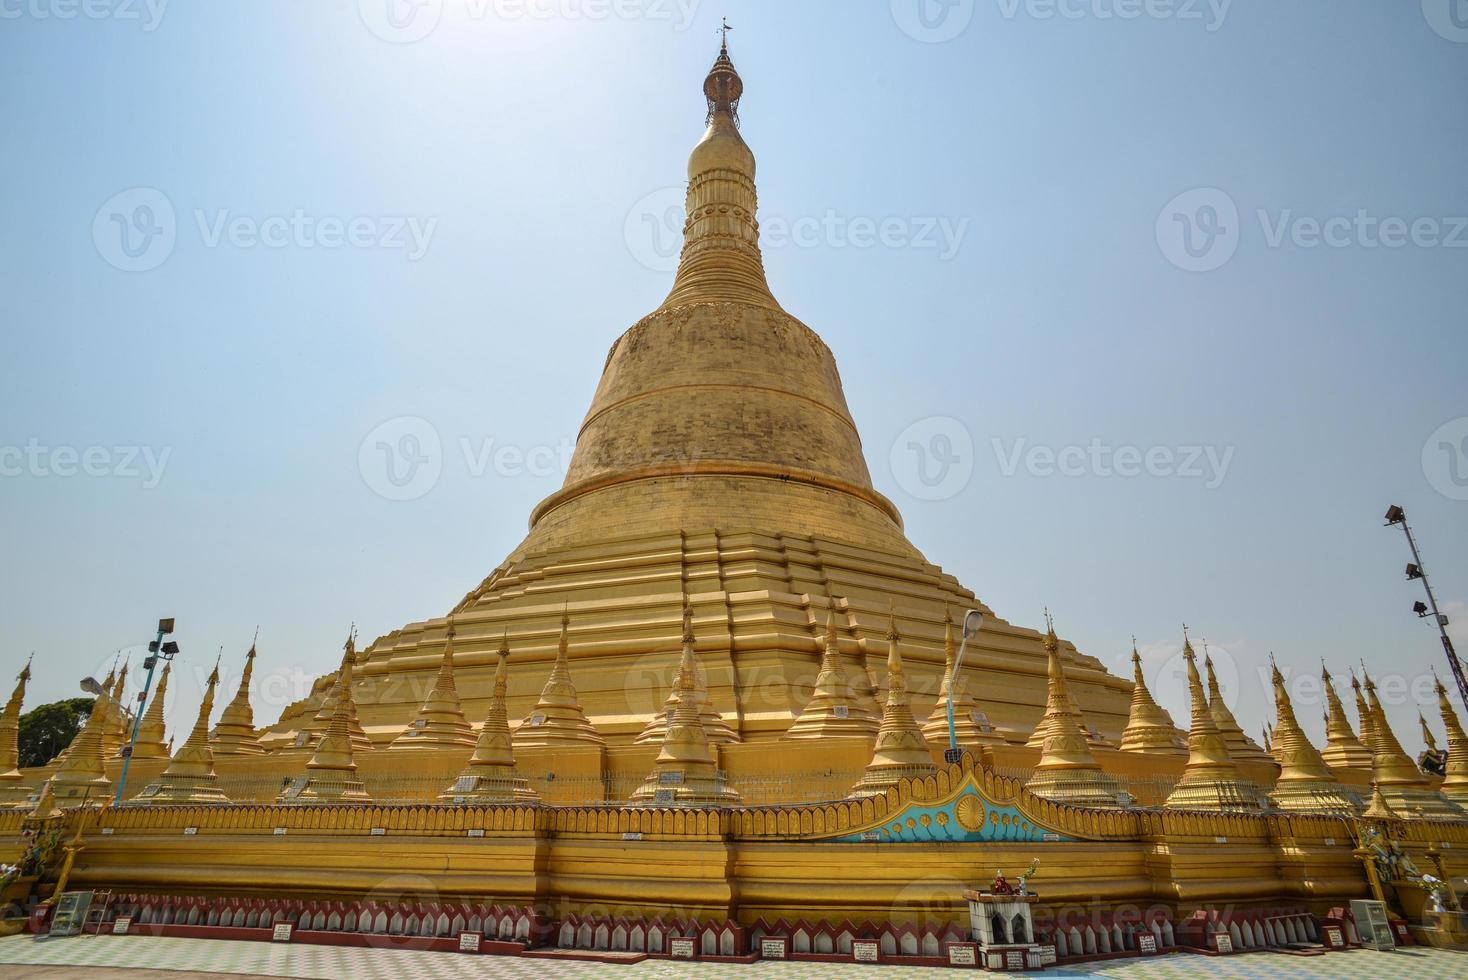 Shwemawdaw Pagoda at Bago, Myanmar photo